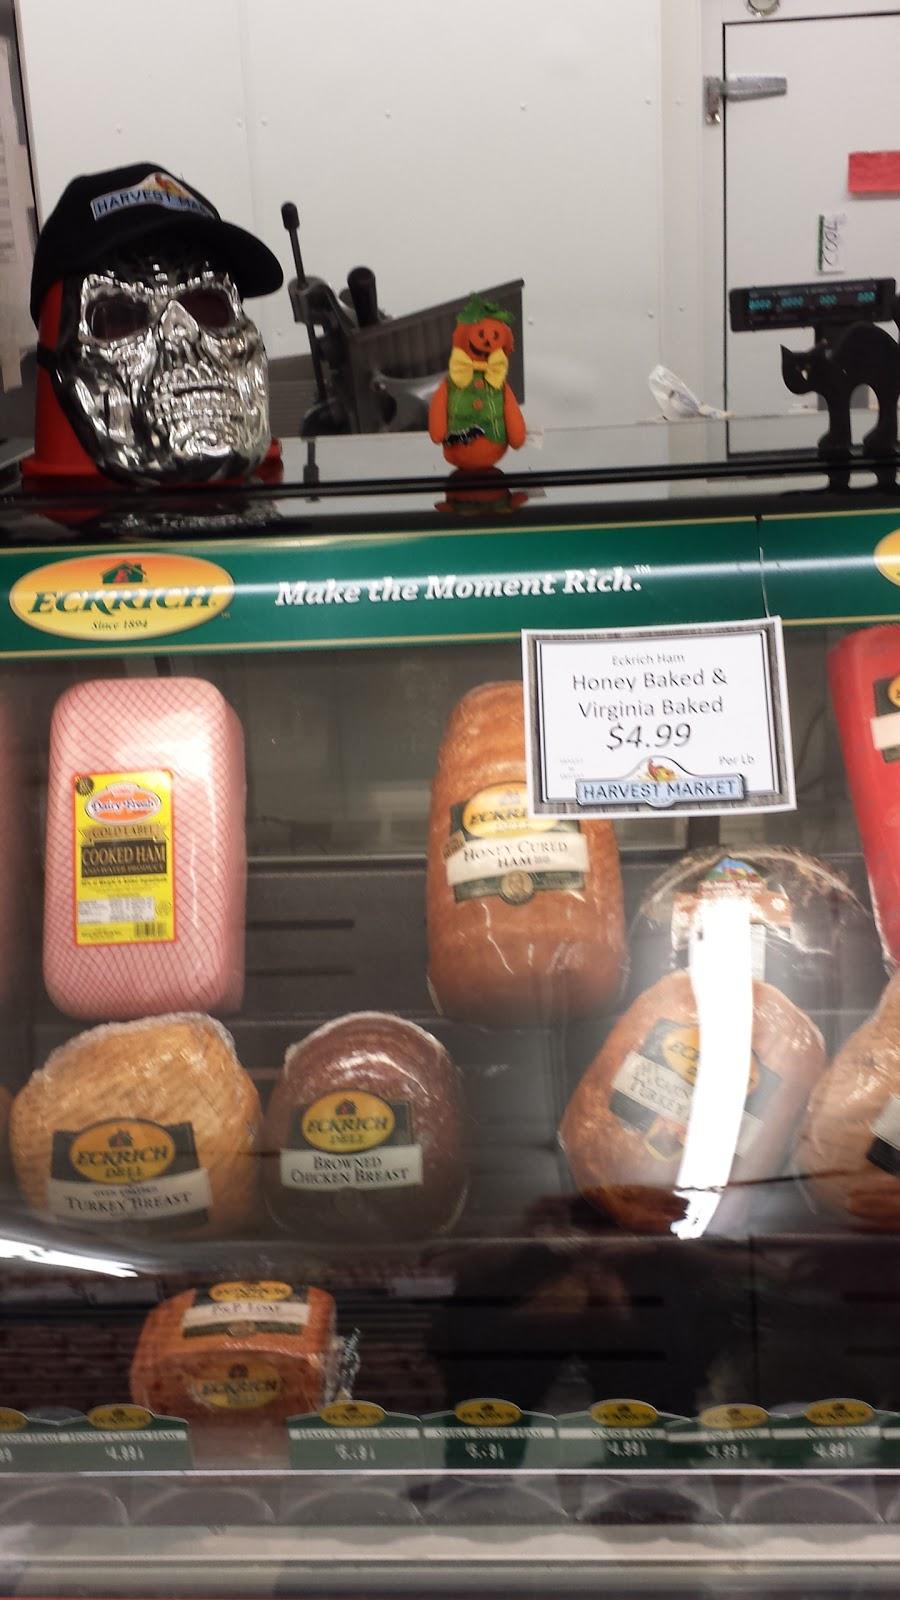 Harvest Supermarket - Frankton, Indiana - store    Photo 10 of 10   Address: 1108 IN-128, Frankton, IN 46044, USA   Phone: (765) 754-1000